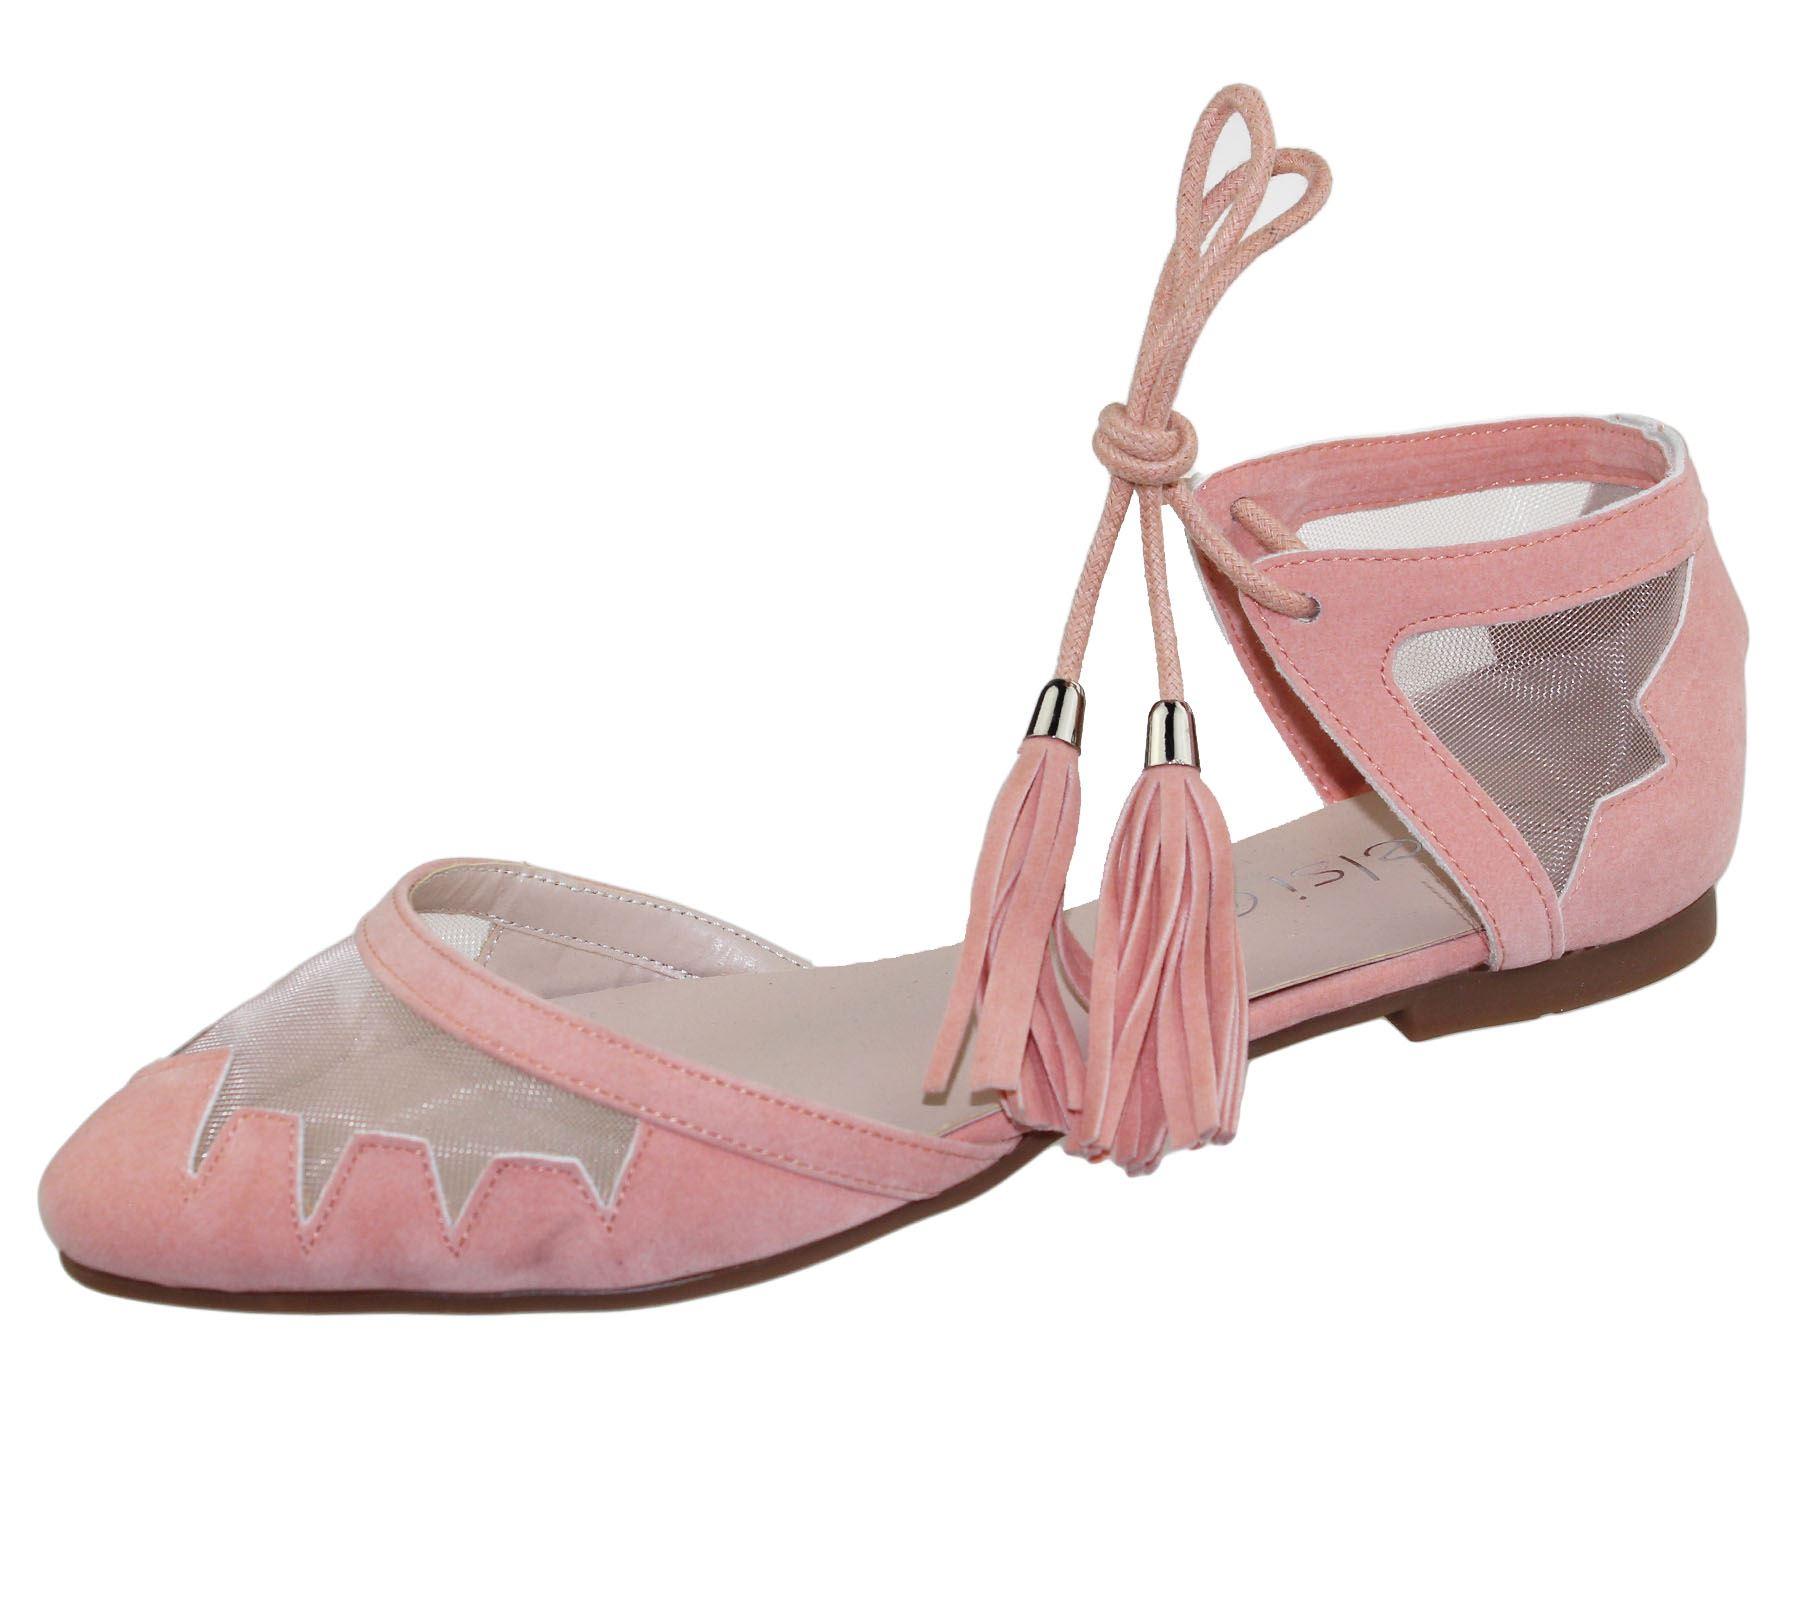 Womens-Flat-Ballerina-Dolly-Pumps-Ballet-Ladies-Summer-Mesh-Tassel-Shoes-Sandals thumbnail 31